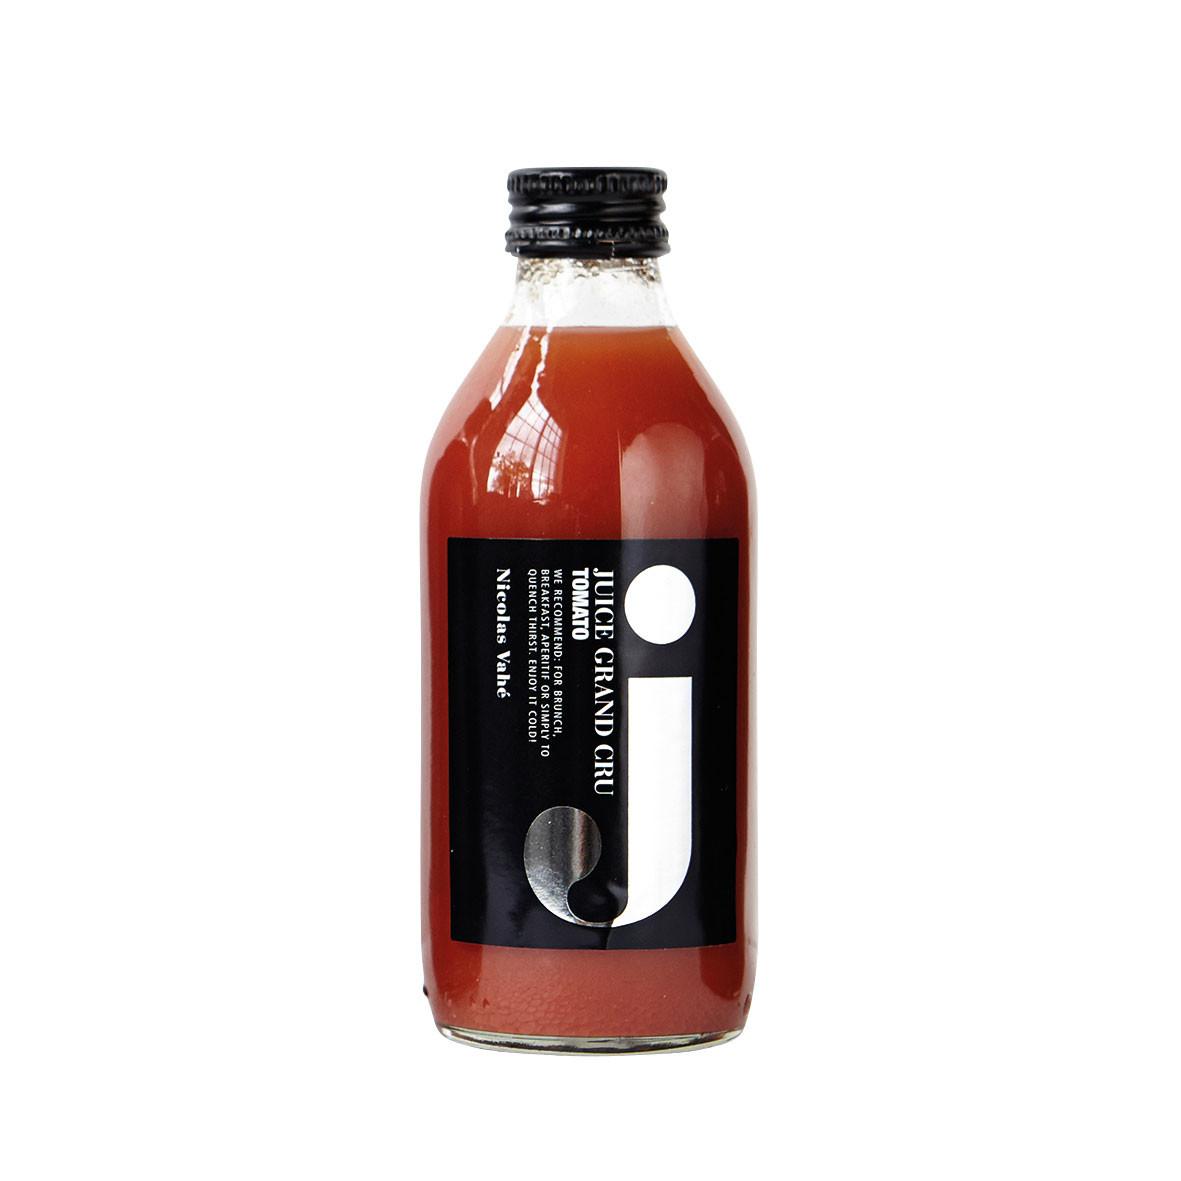 Nicolas vahé Nicolas vahé juice tomat på livingshop